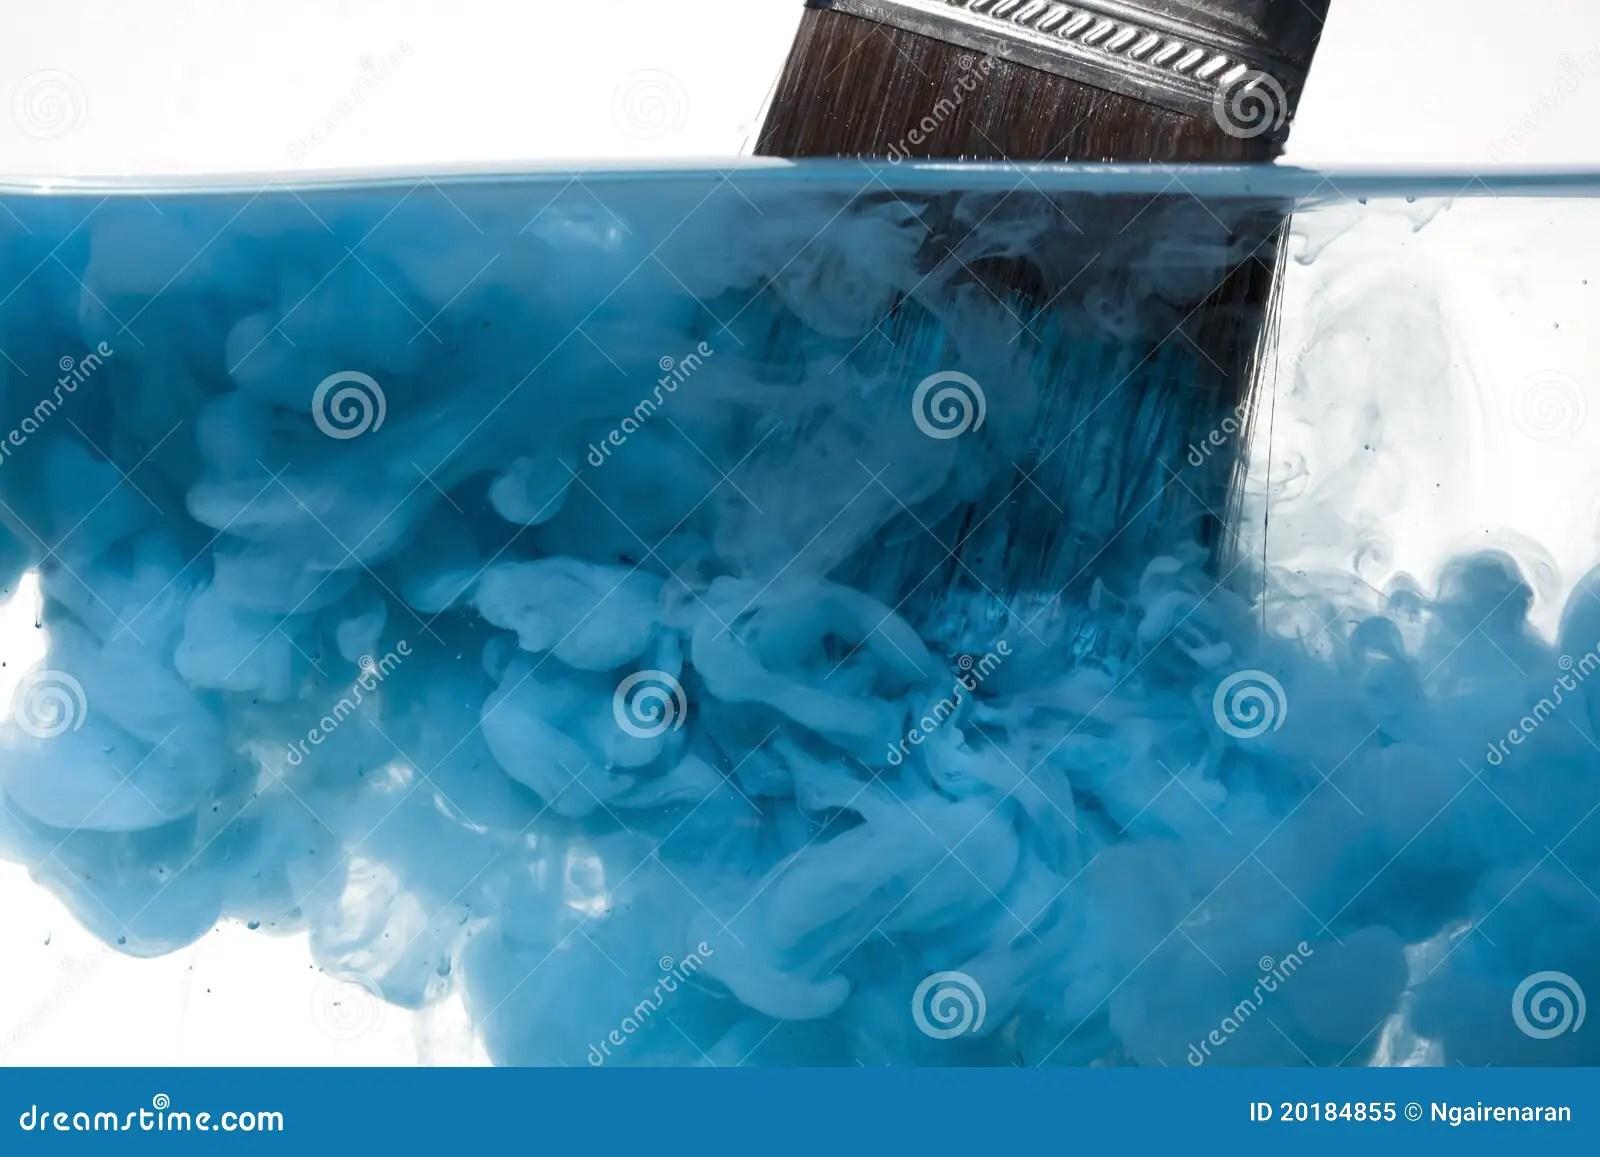 Exterior Paint Brush